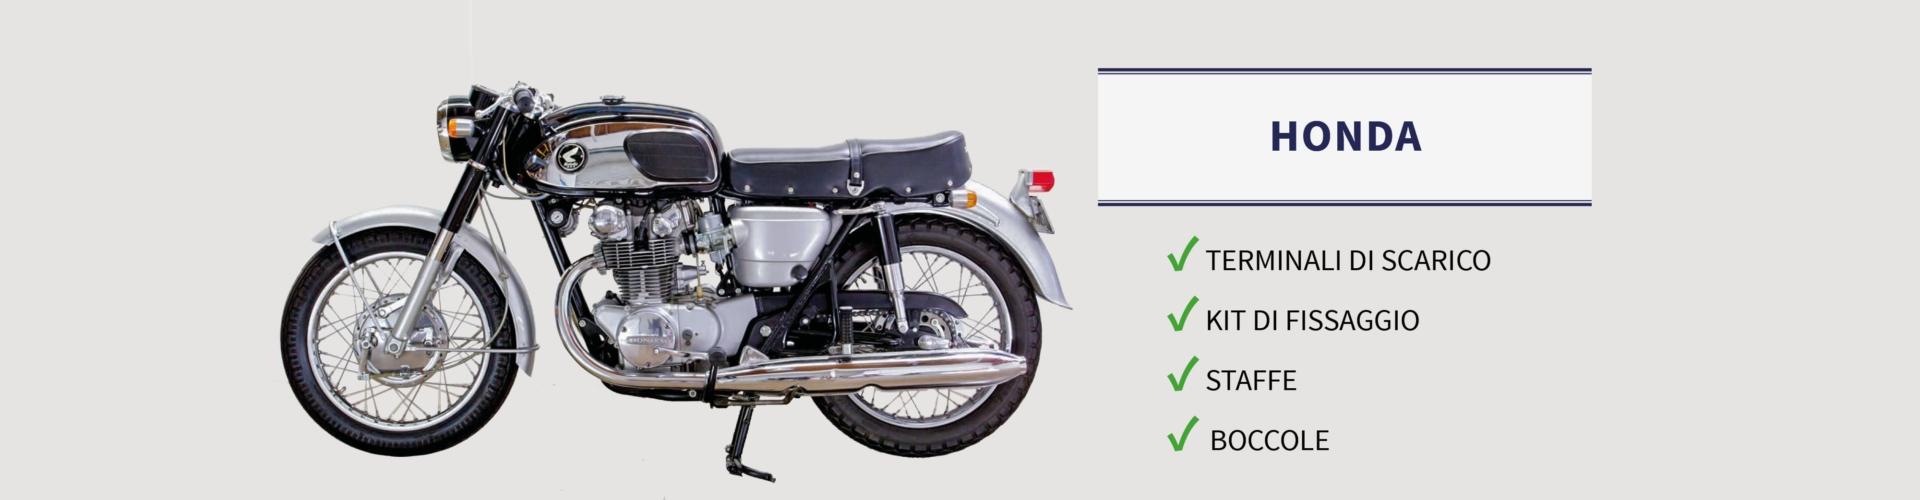 moto-storiche-italiane-terminali-moto-epoca-honda-four-rid